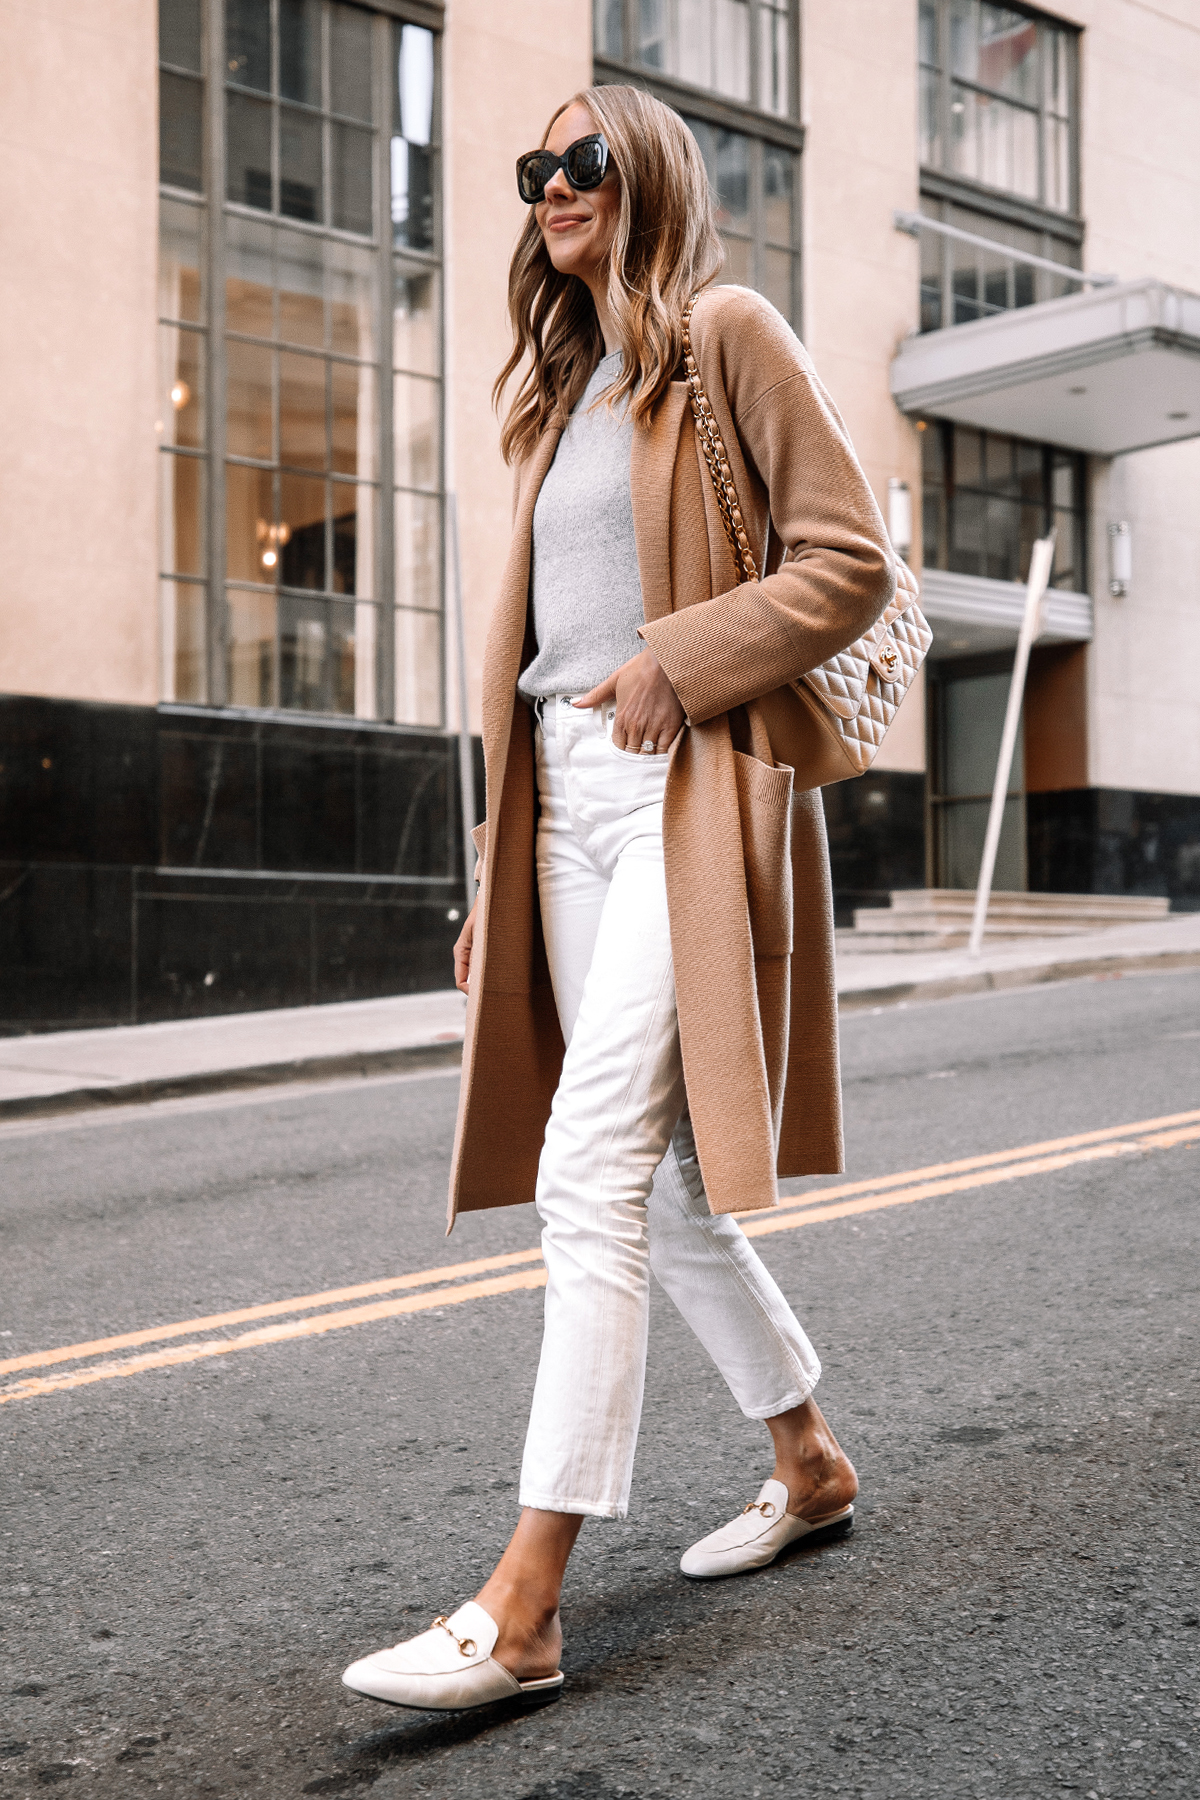 Fashion Jackson Wearing Tan Cardigan Grey Sweater White Jeans White Gucci Princetown Mules Street Style 1